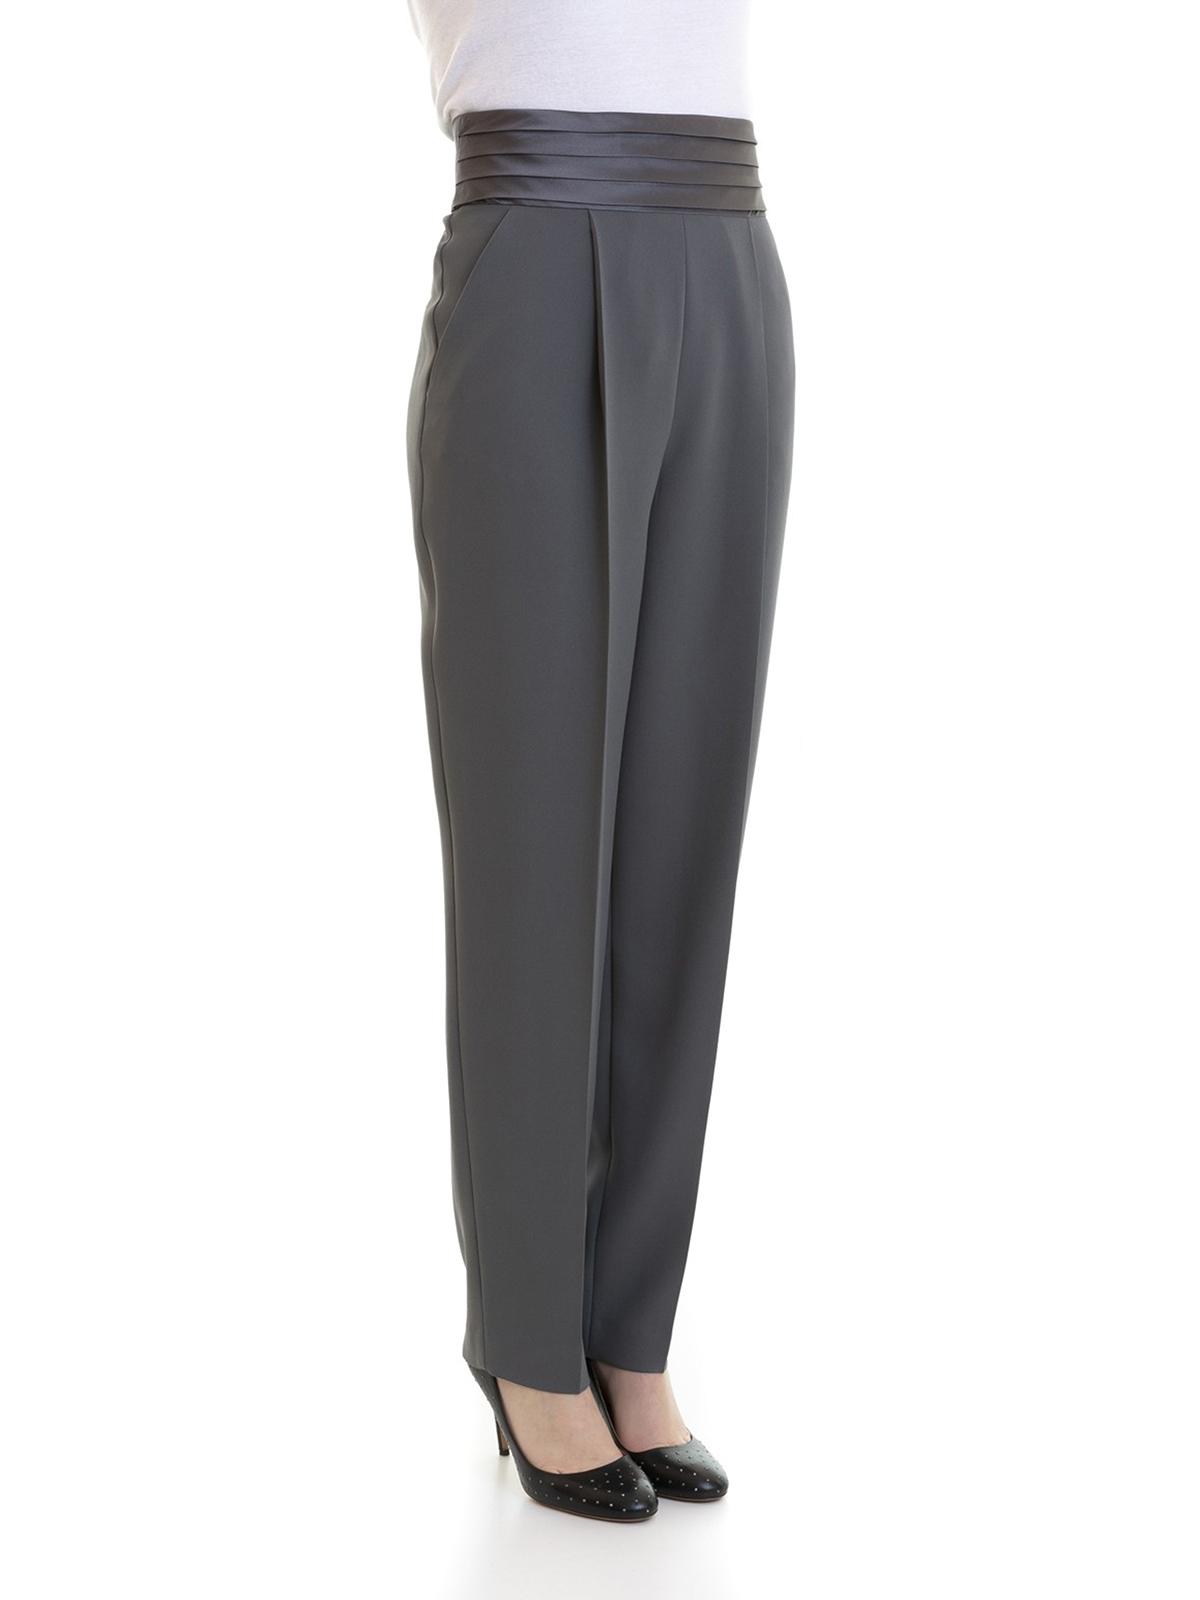 the latest f0dfb 14aac Emporio Armani - Pantalone da smoking grigio - Pantaloni ...